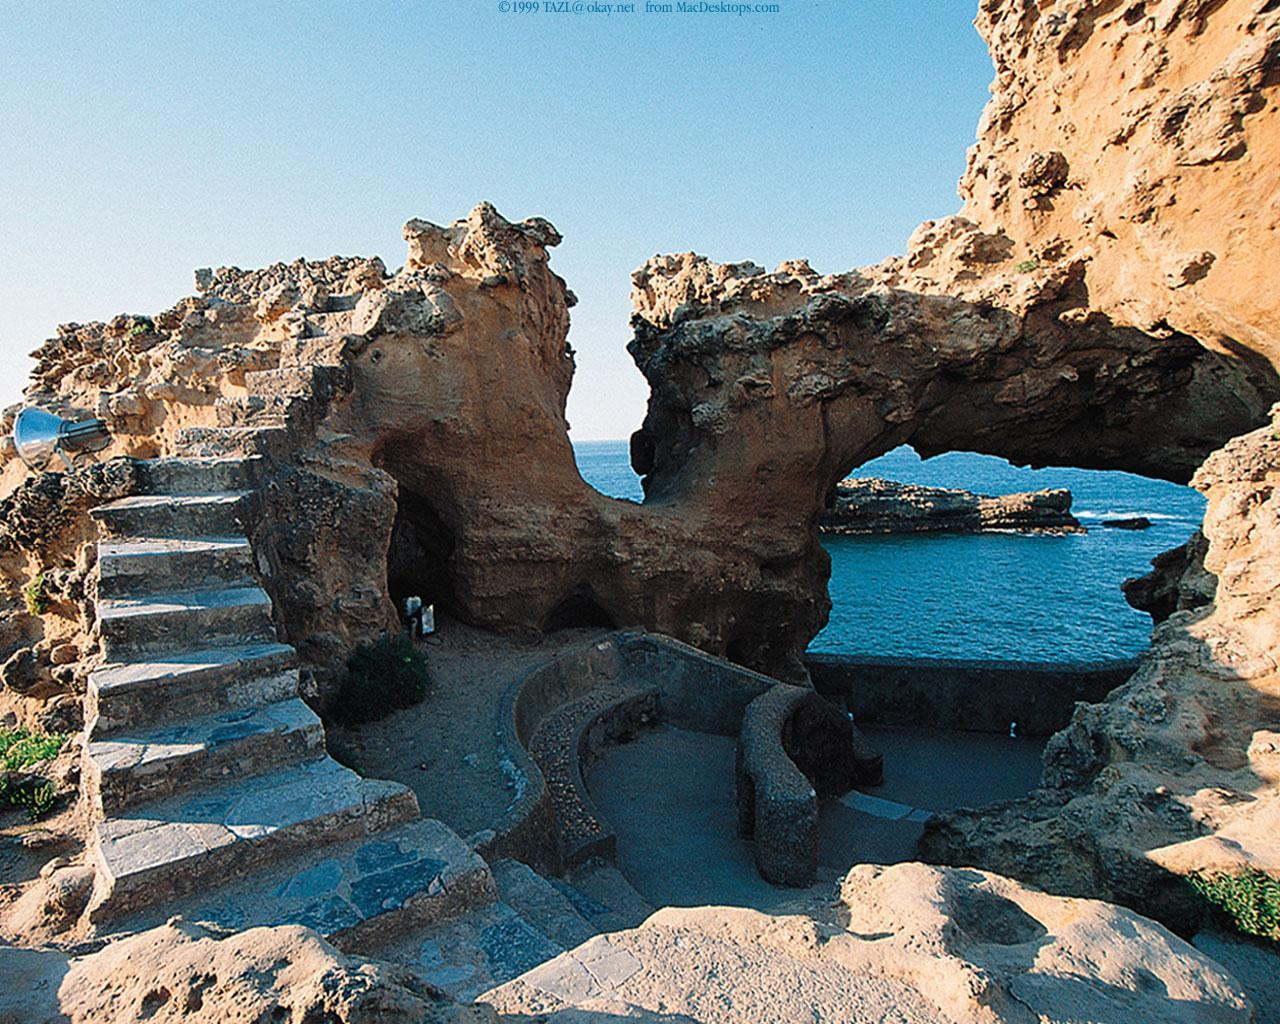 Ce curiozitati poti descoperi intr-un concediu in Creta